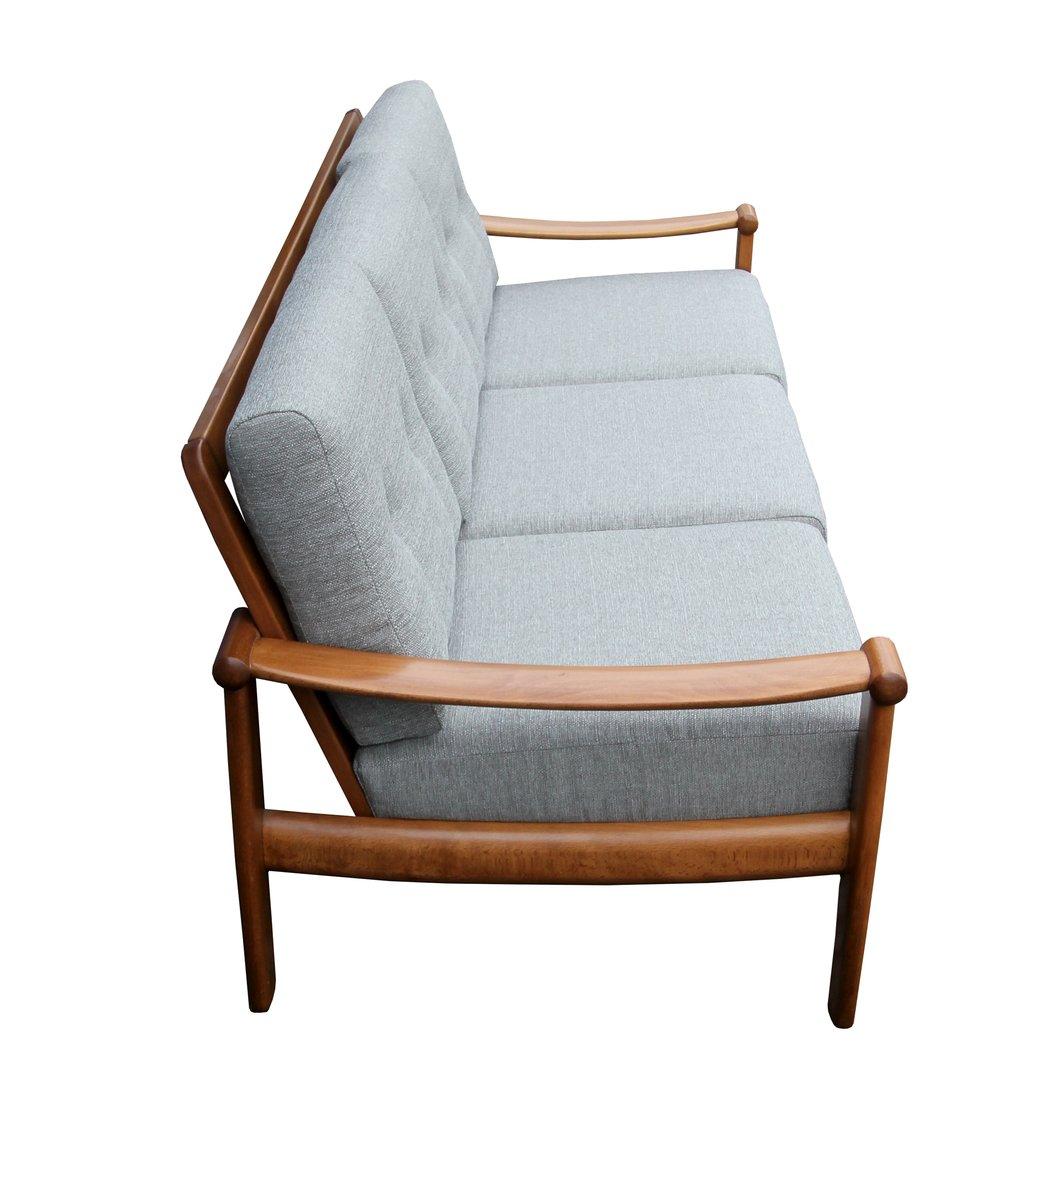 hellgraues 3 sitzer sofa 1960er bei pamono kaufen. Black Bedroom Furniture Sets. Home Design Ideas